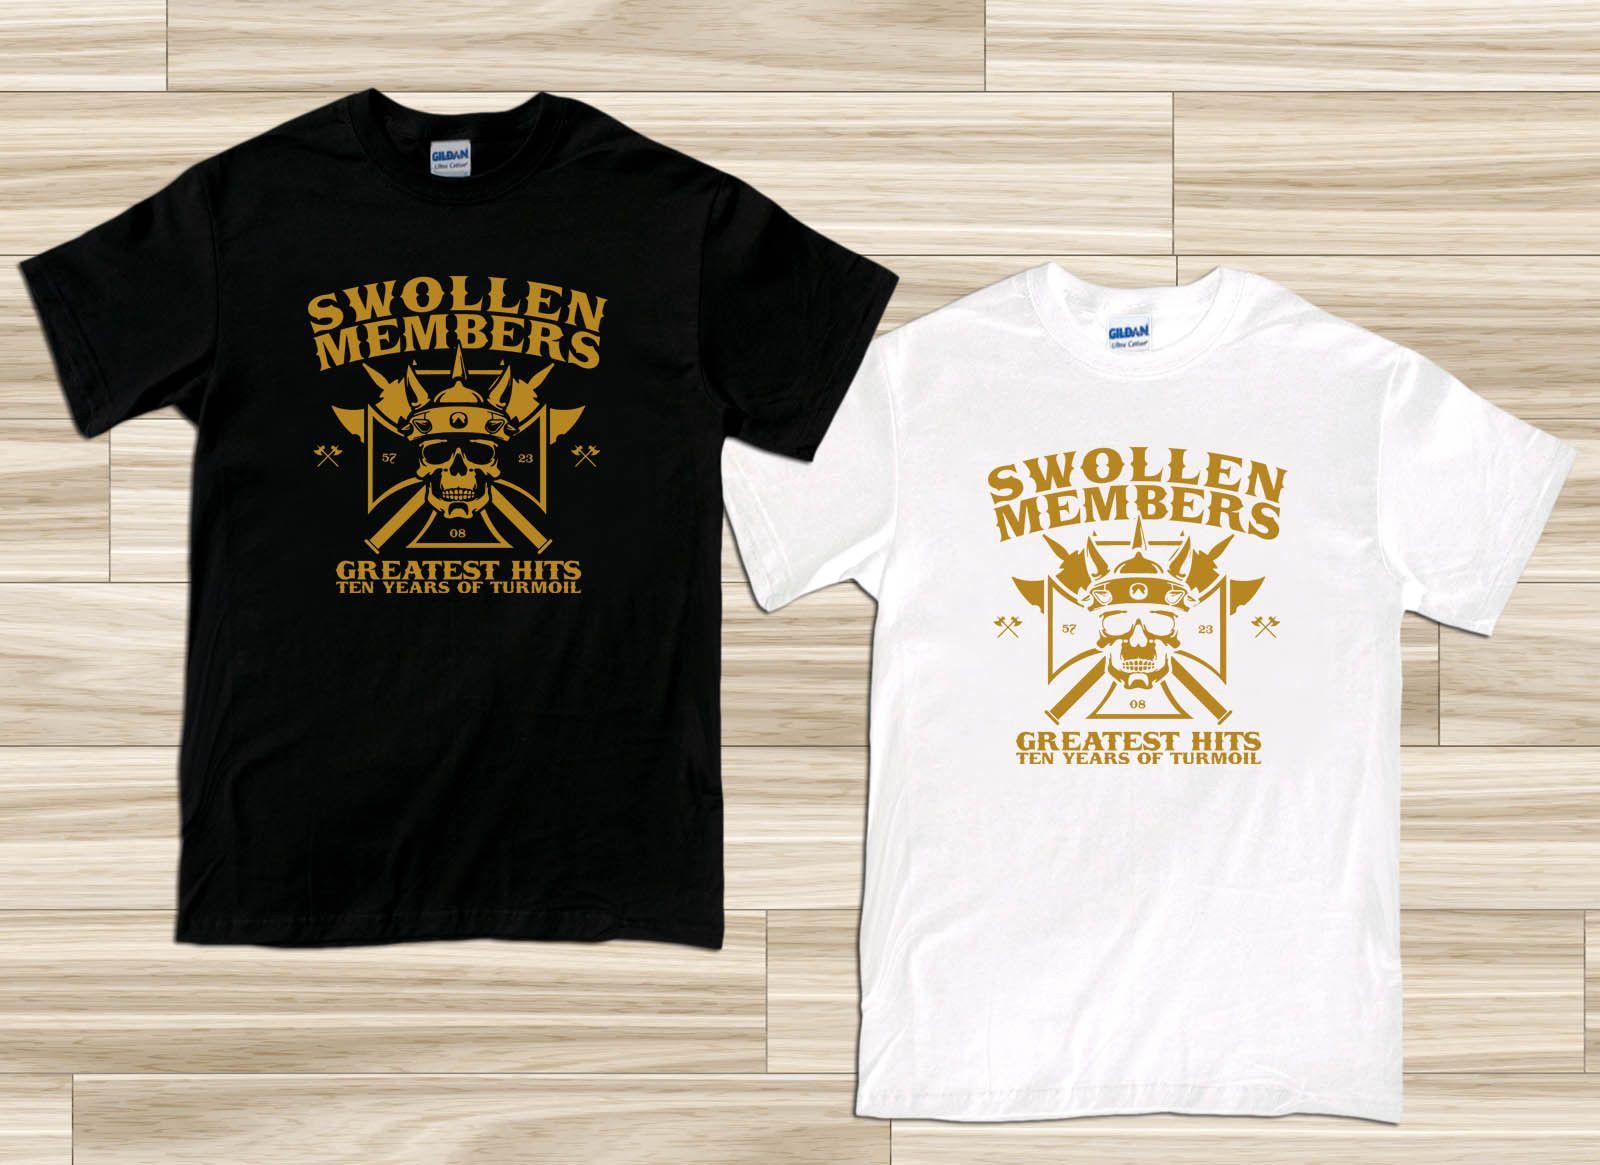 d6fa33a9e768 Swollen Members Greatest Hits Rap Hip Hop Men S Black White T Shirt Size S  3XL Top T Shirt Jersey Print T Shirt T Shirts Shop Online Of T Shirts From  Vascup ...